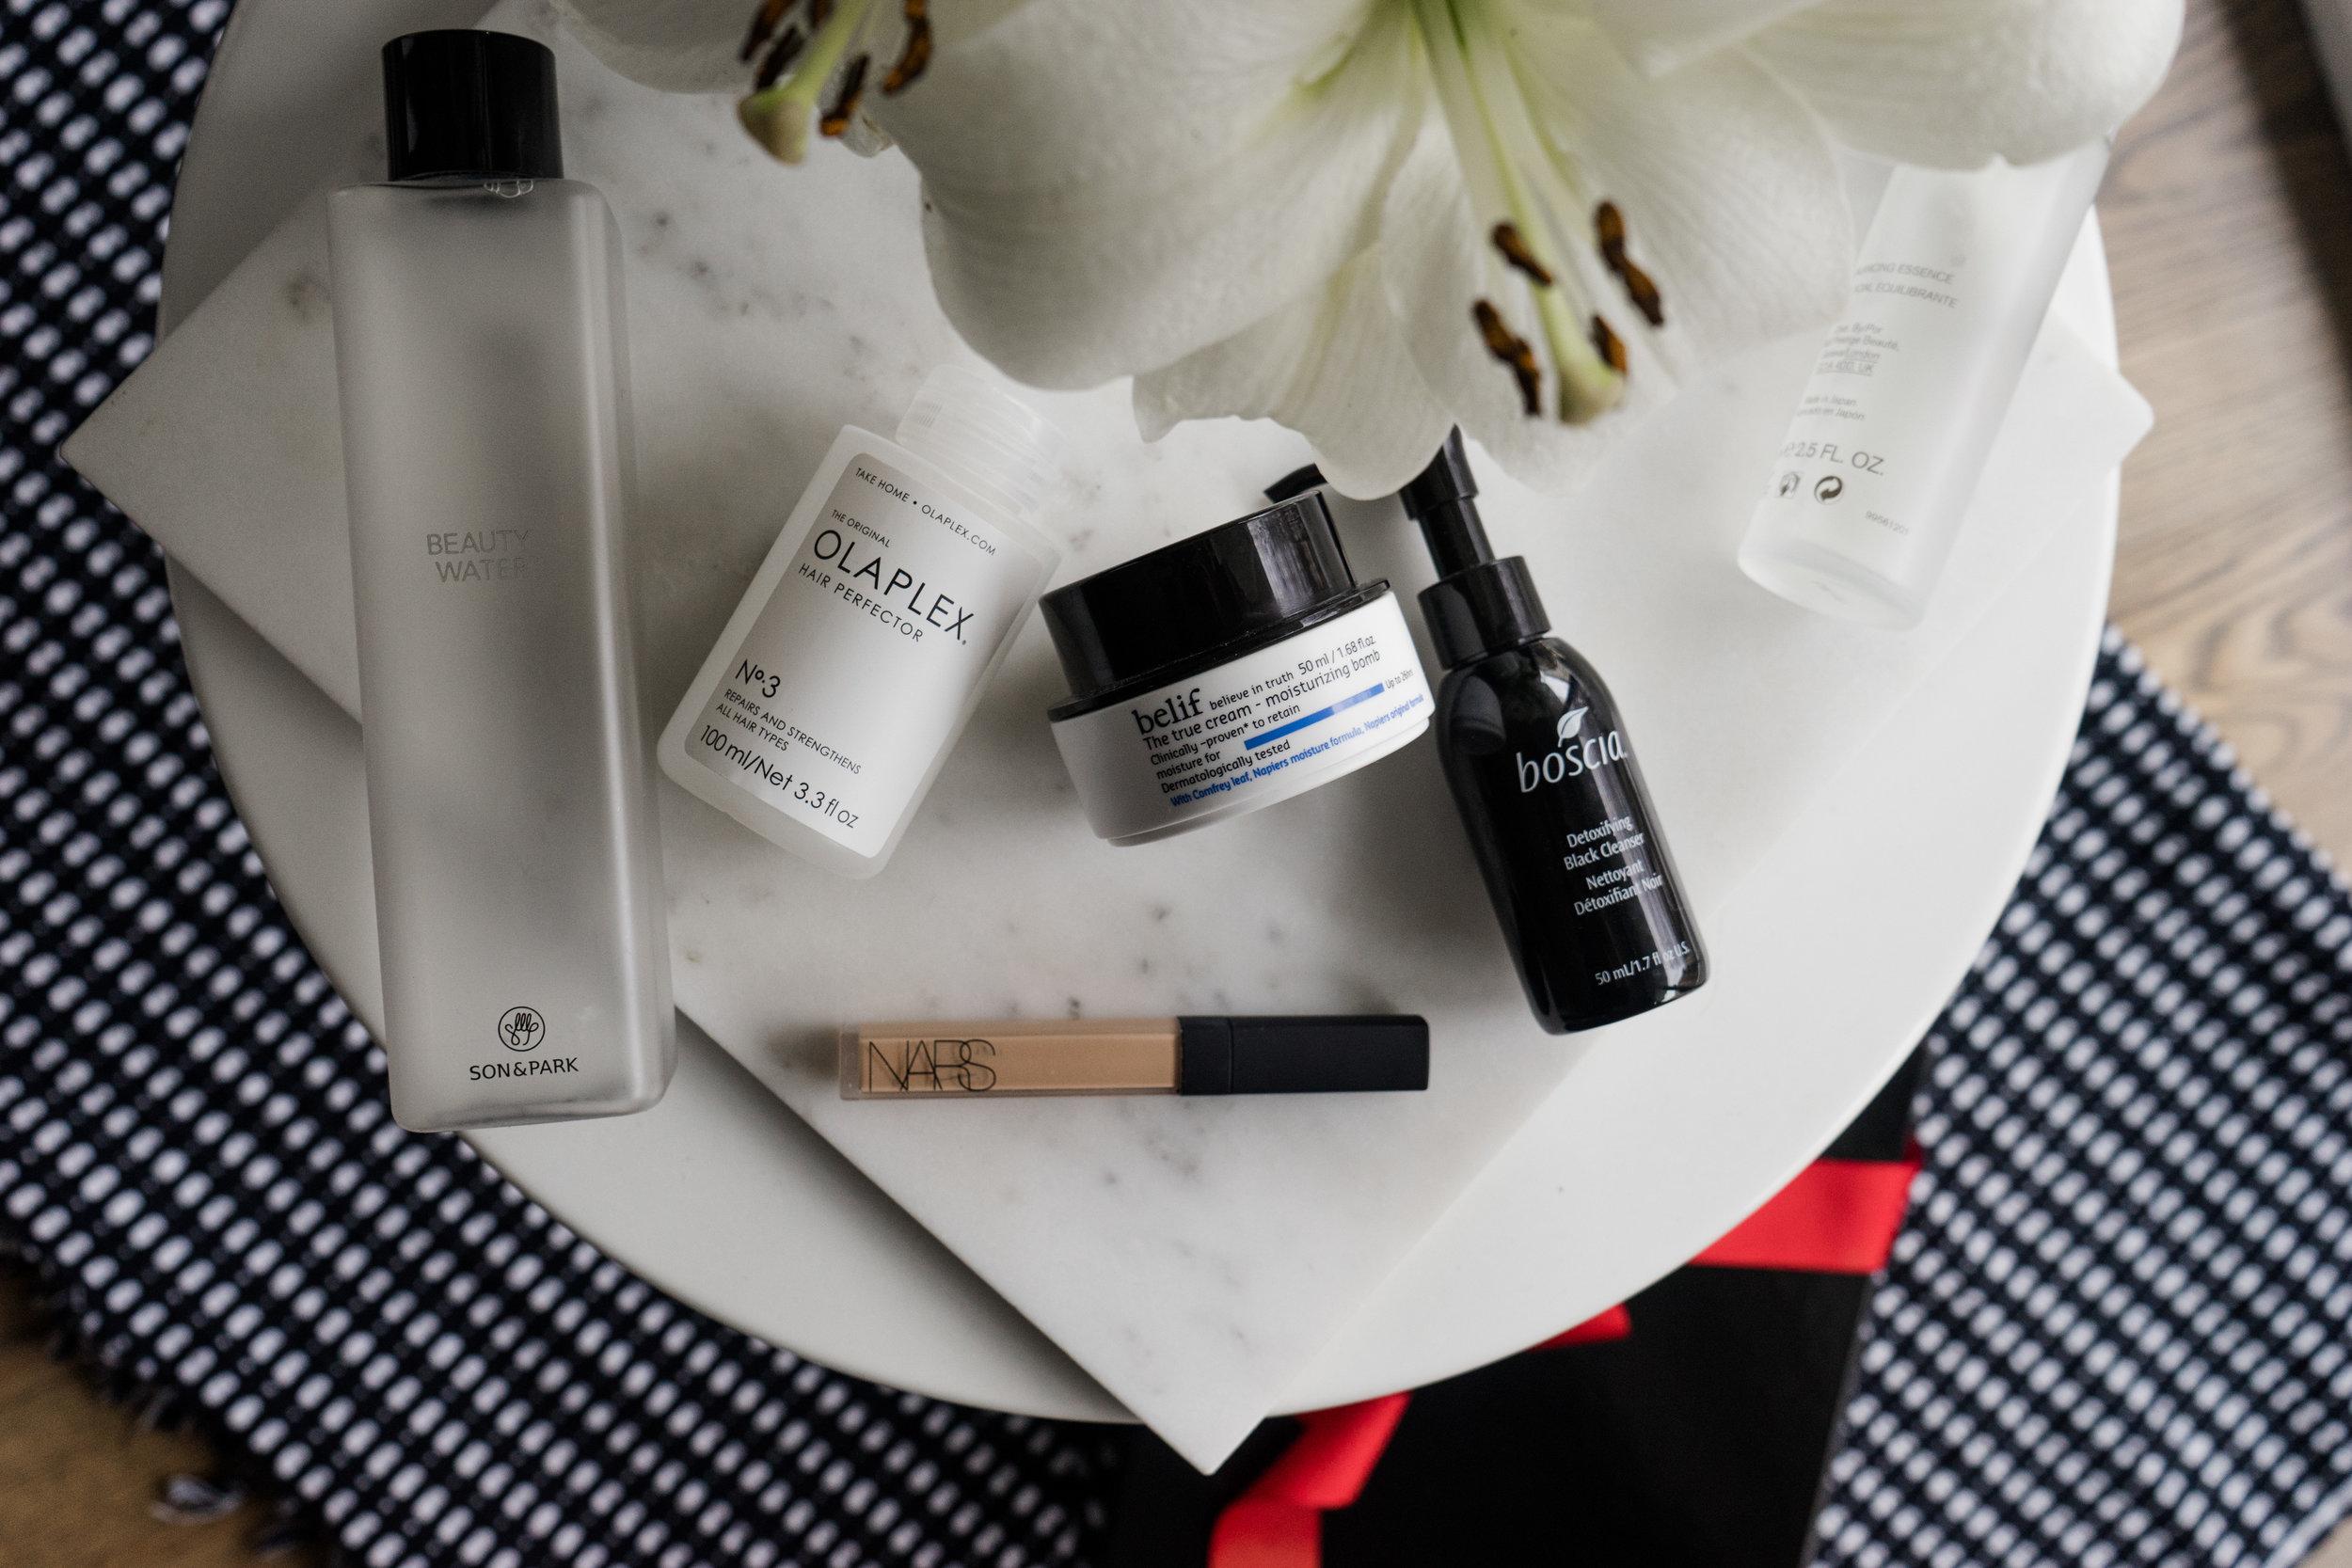 Sephora Sale Tips & Picks April 2018: TheNinesBlog.com - A Boston Blog